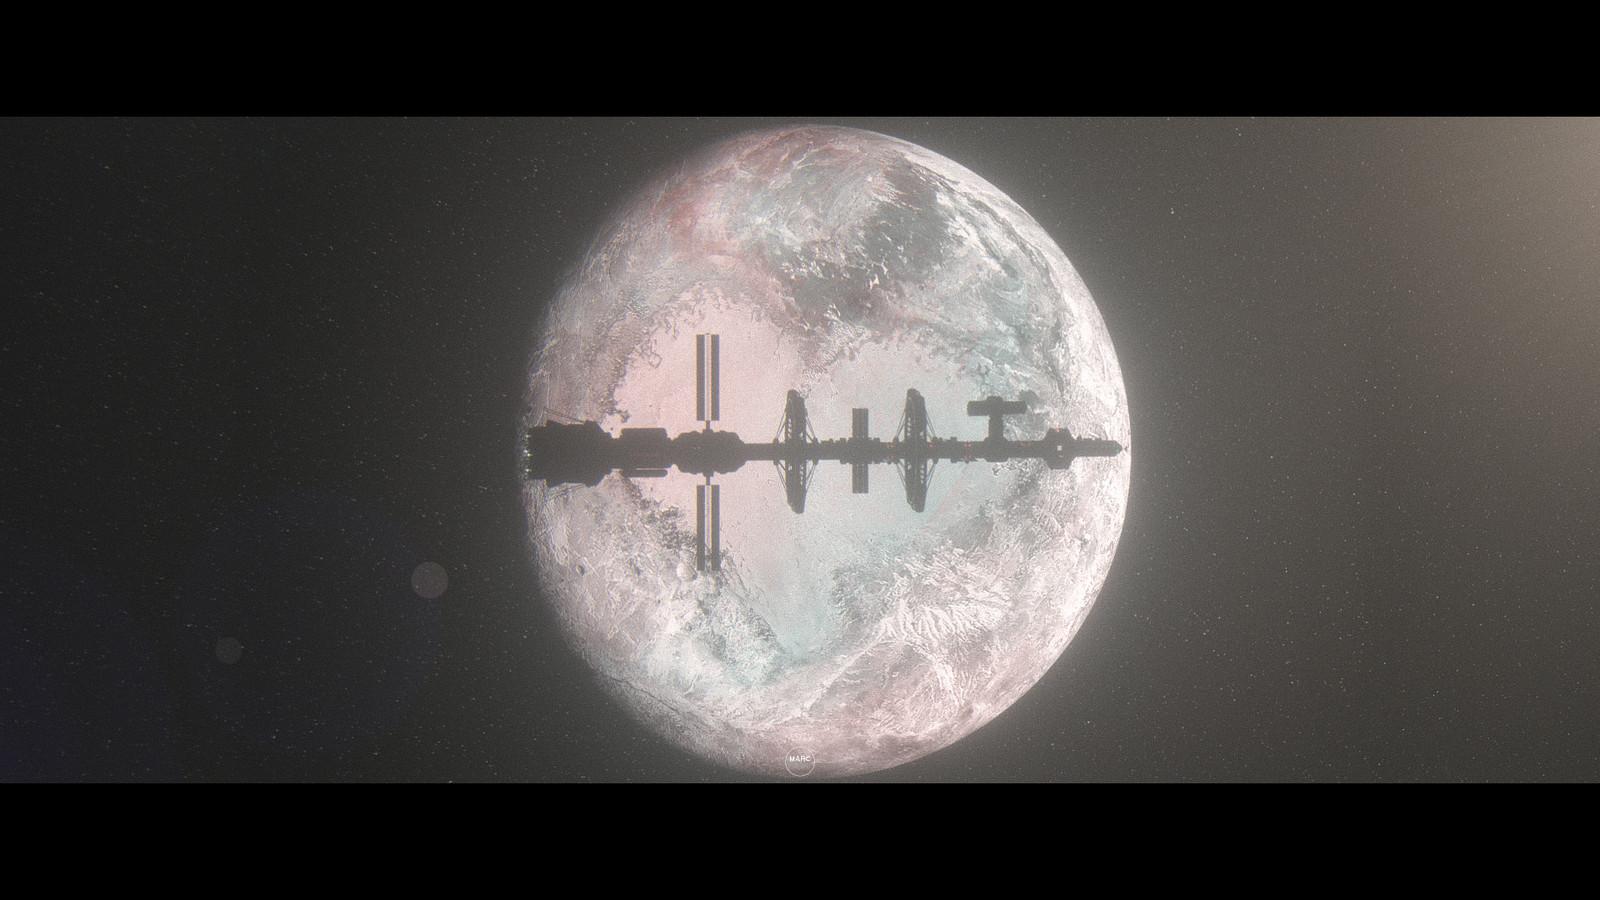 Daybreak orbiting Pluto